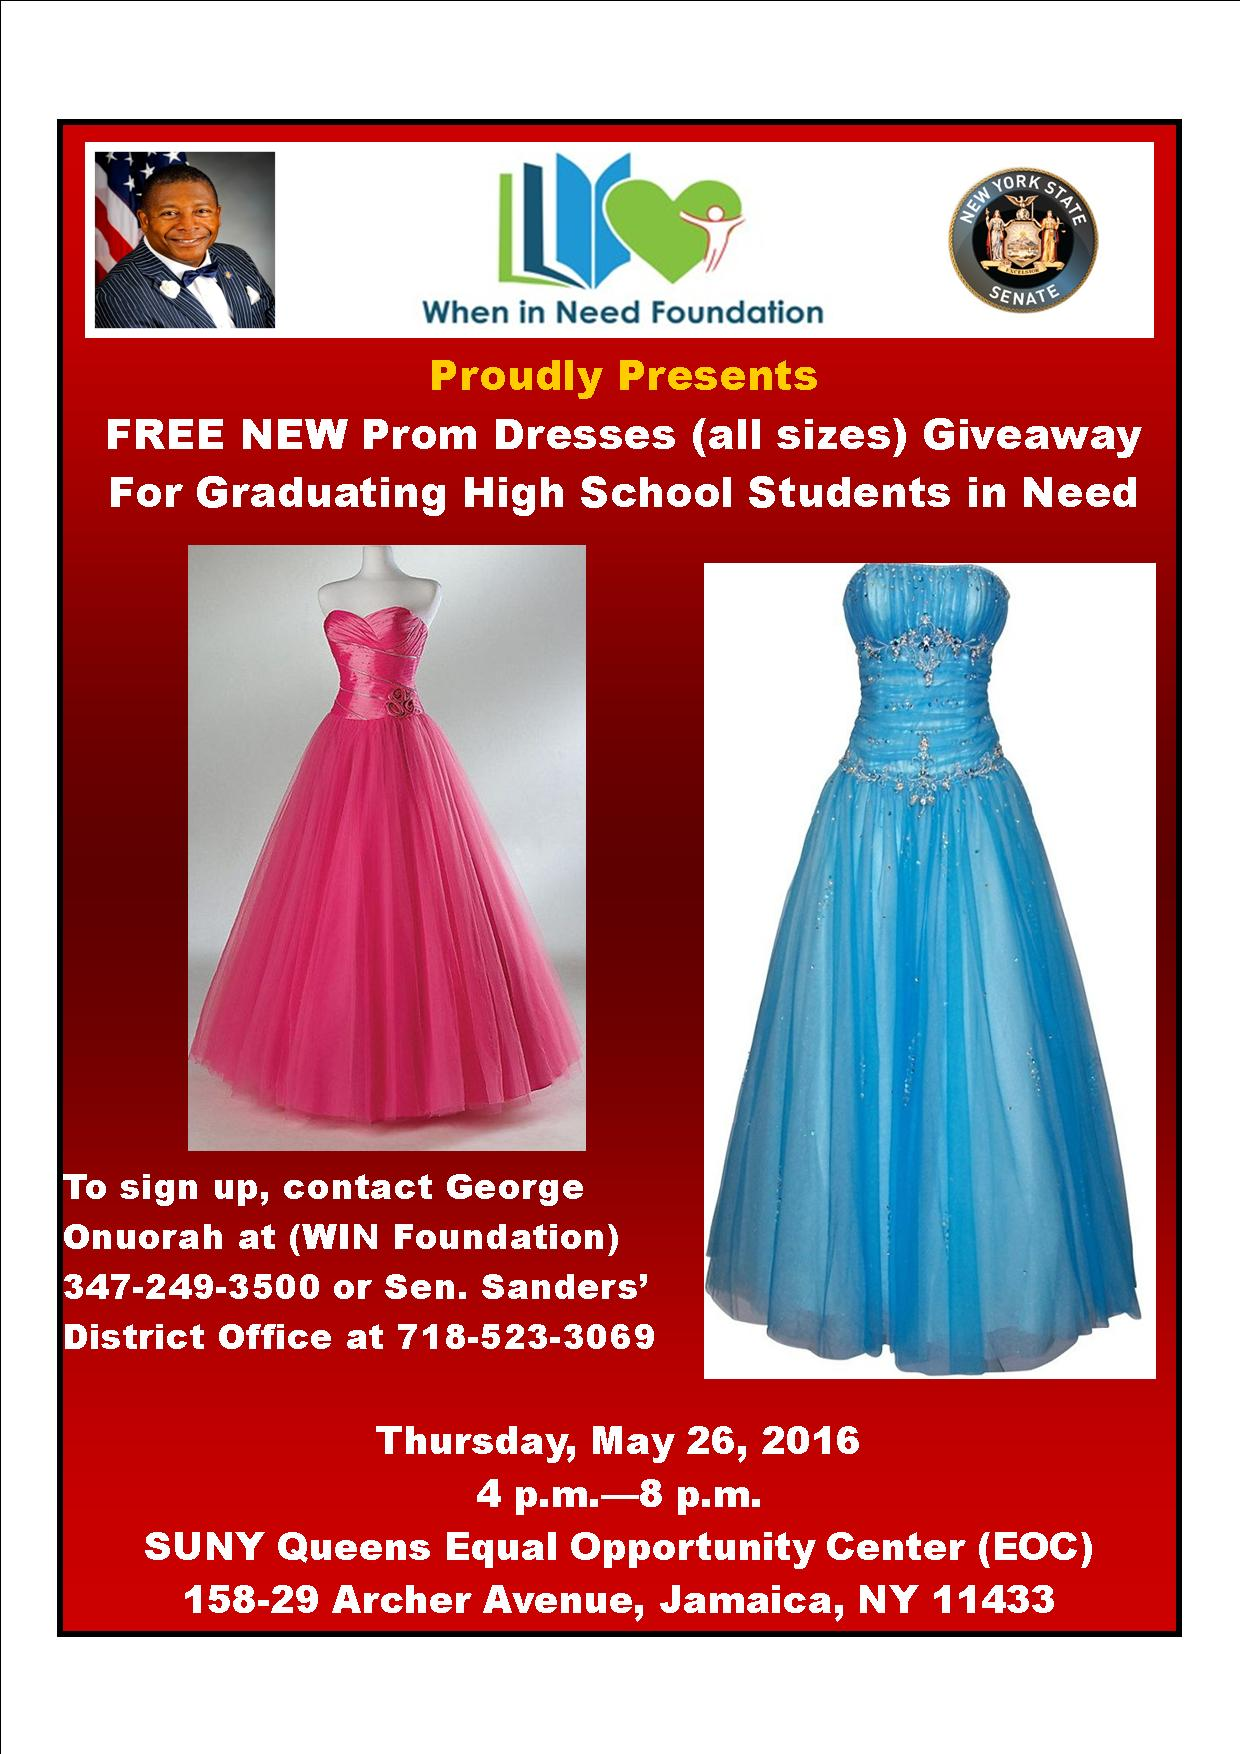 Free, Brand New Prom Dress Giveaway – Jamaica 311